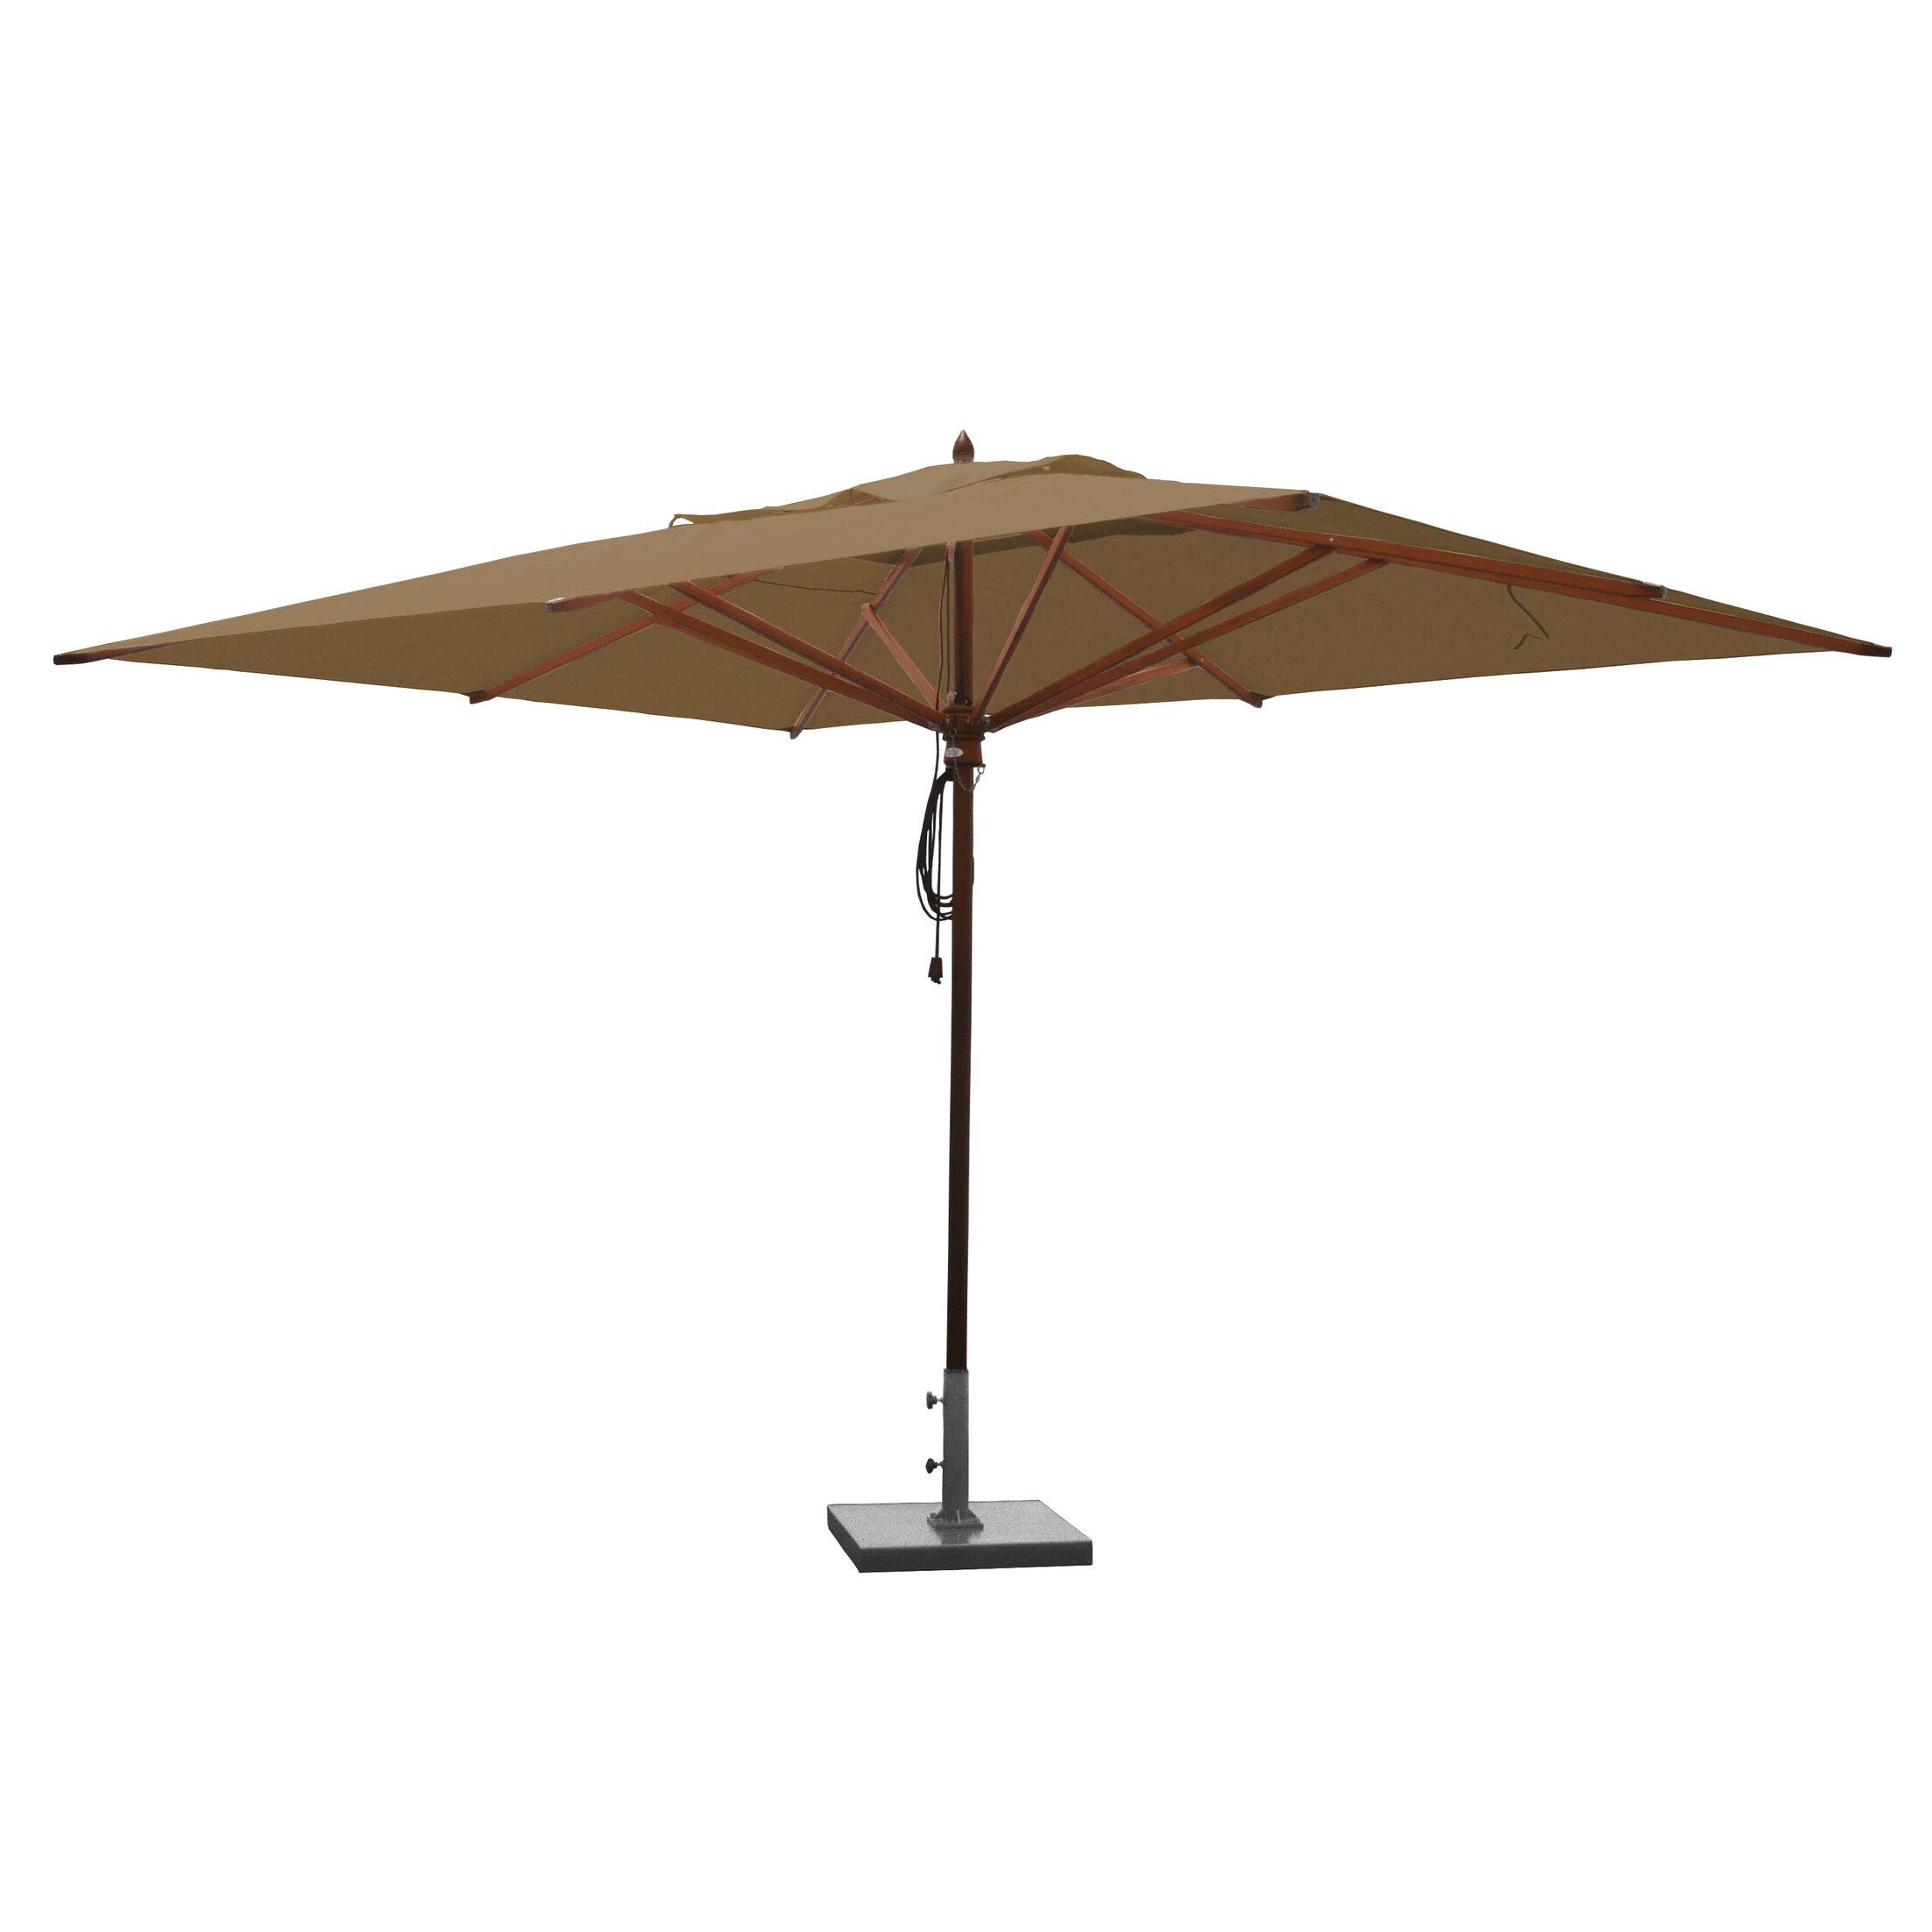 13' X 10' Rectangular Market Umbrella Fabric: Beige